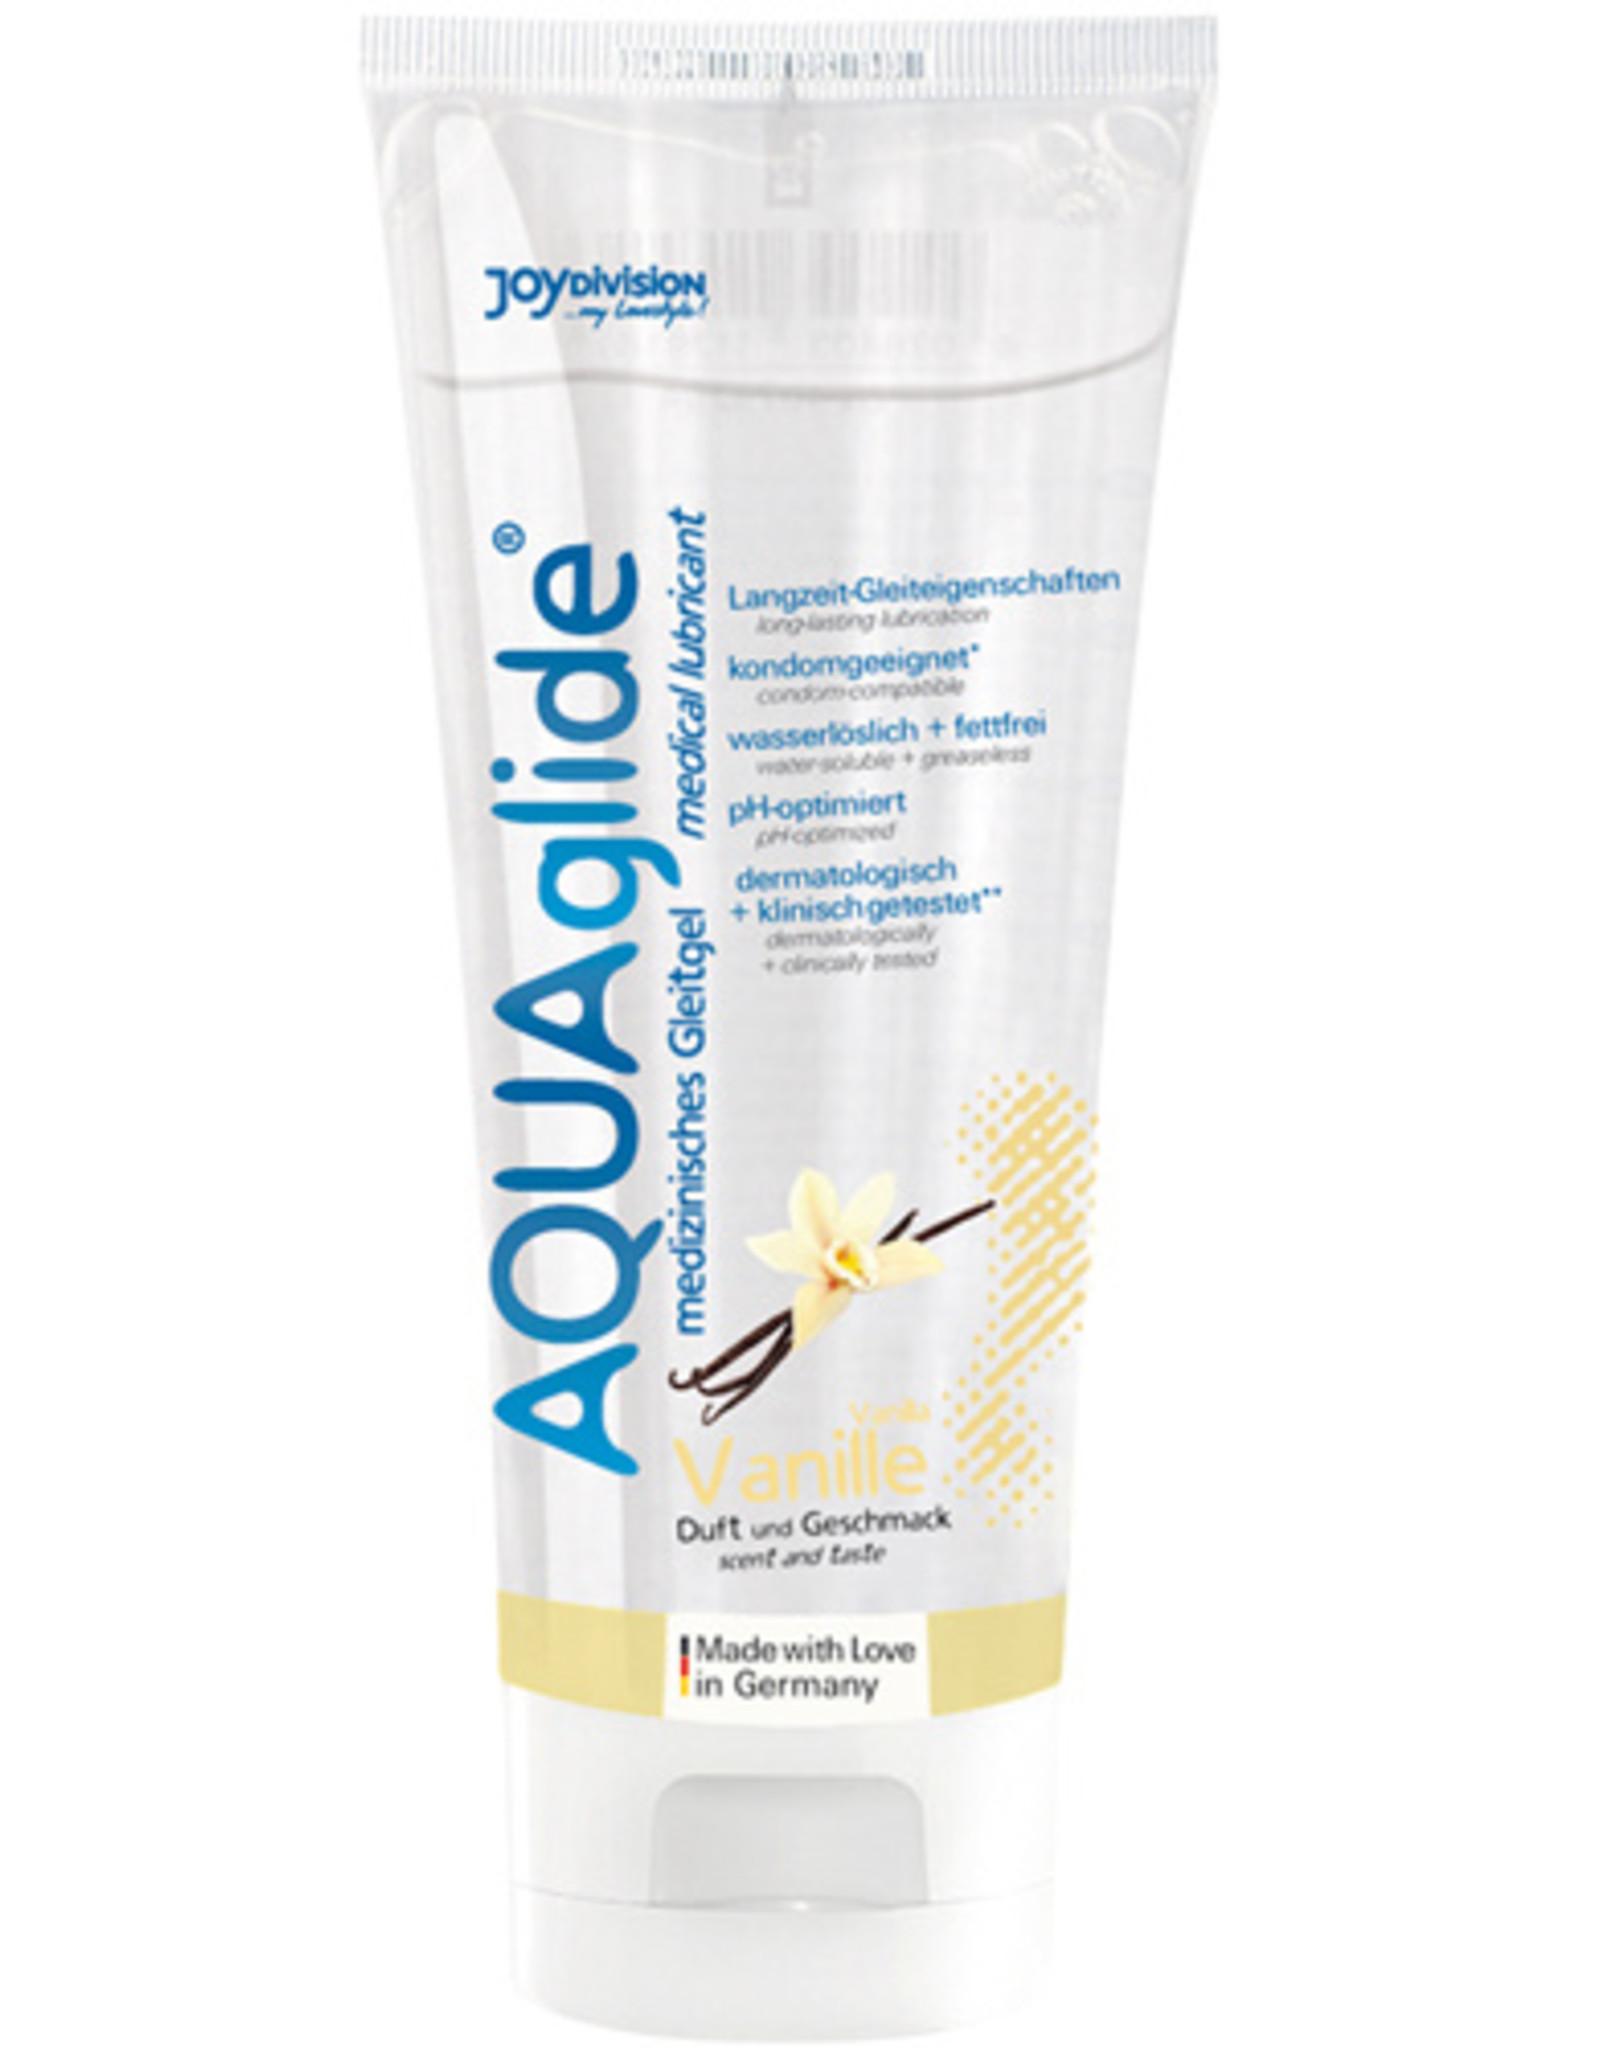 Joydivision AQUAglide Glijmiddel Vanille - 100 ml